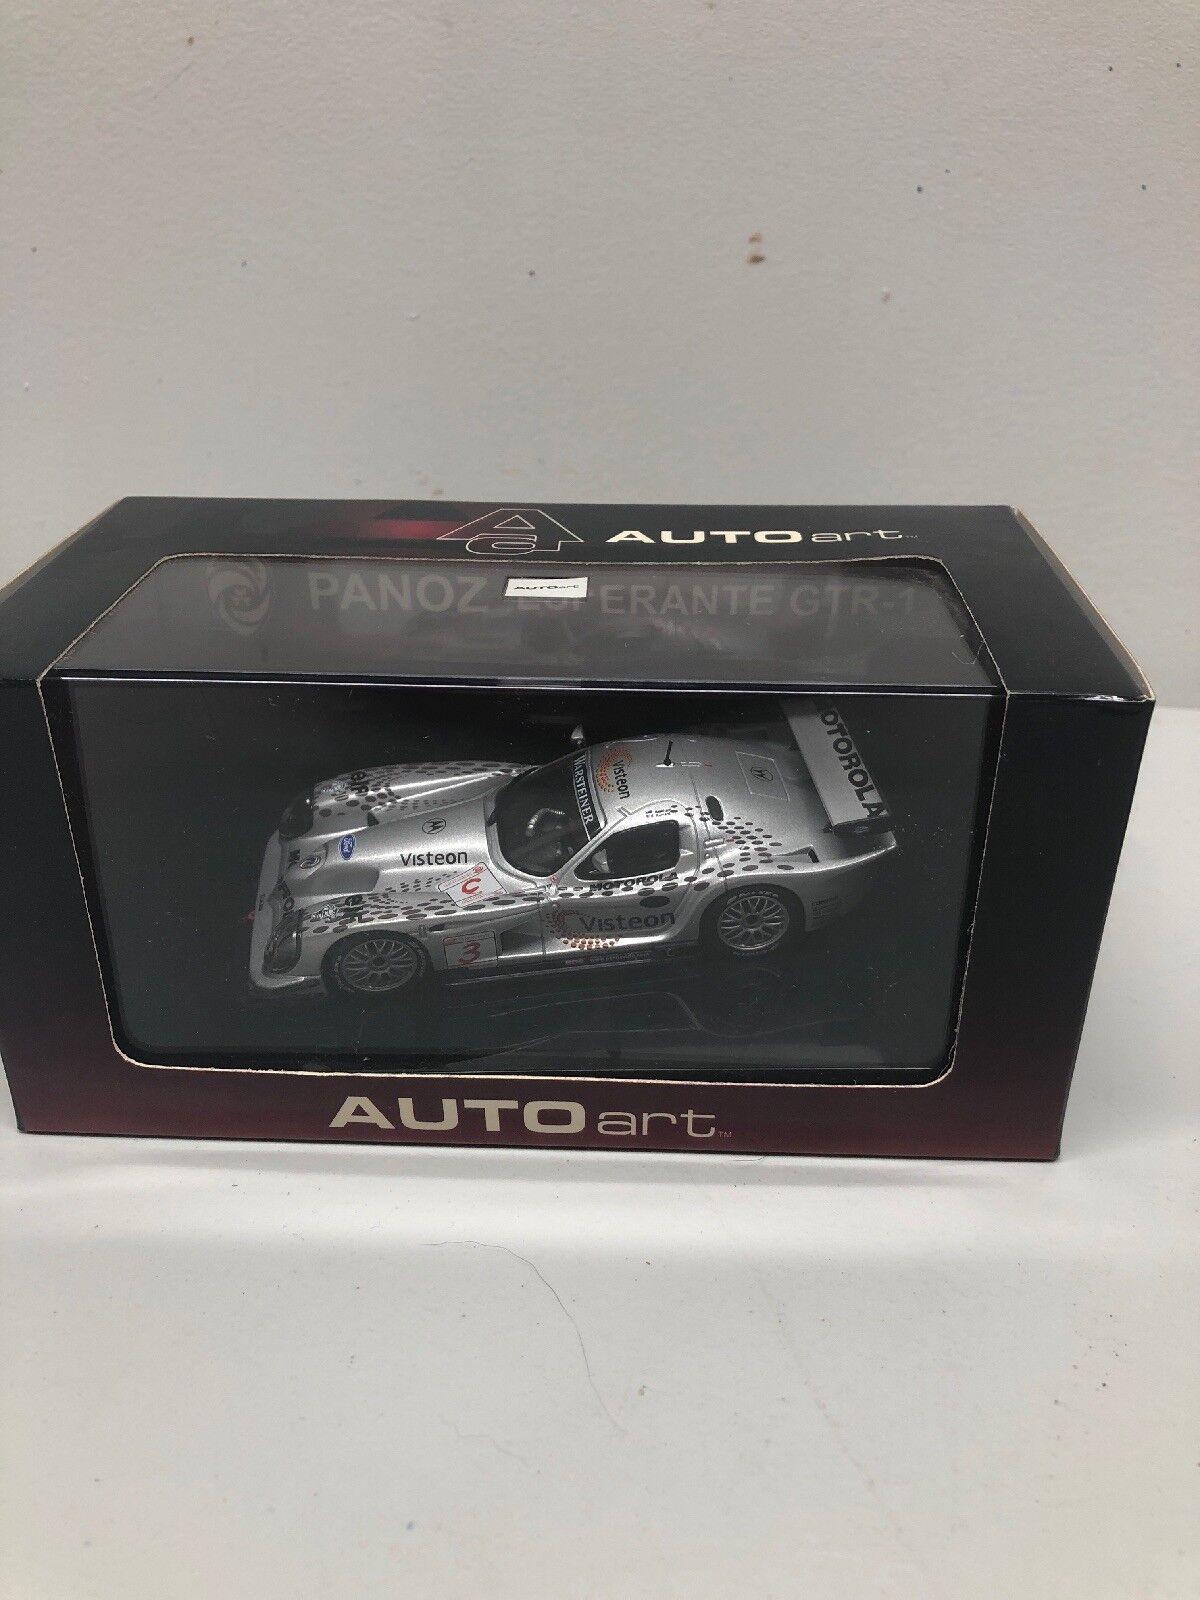 1 43 Autoart  Panoz Ligas GTR-1   3 3 3 equipo Visteon MIB Motorola 538594